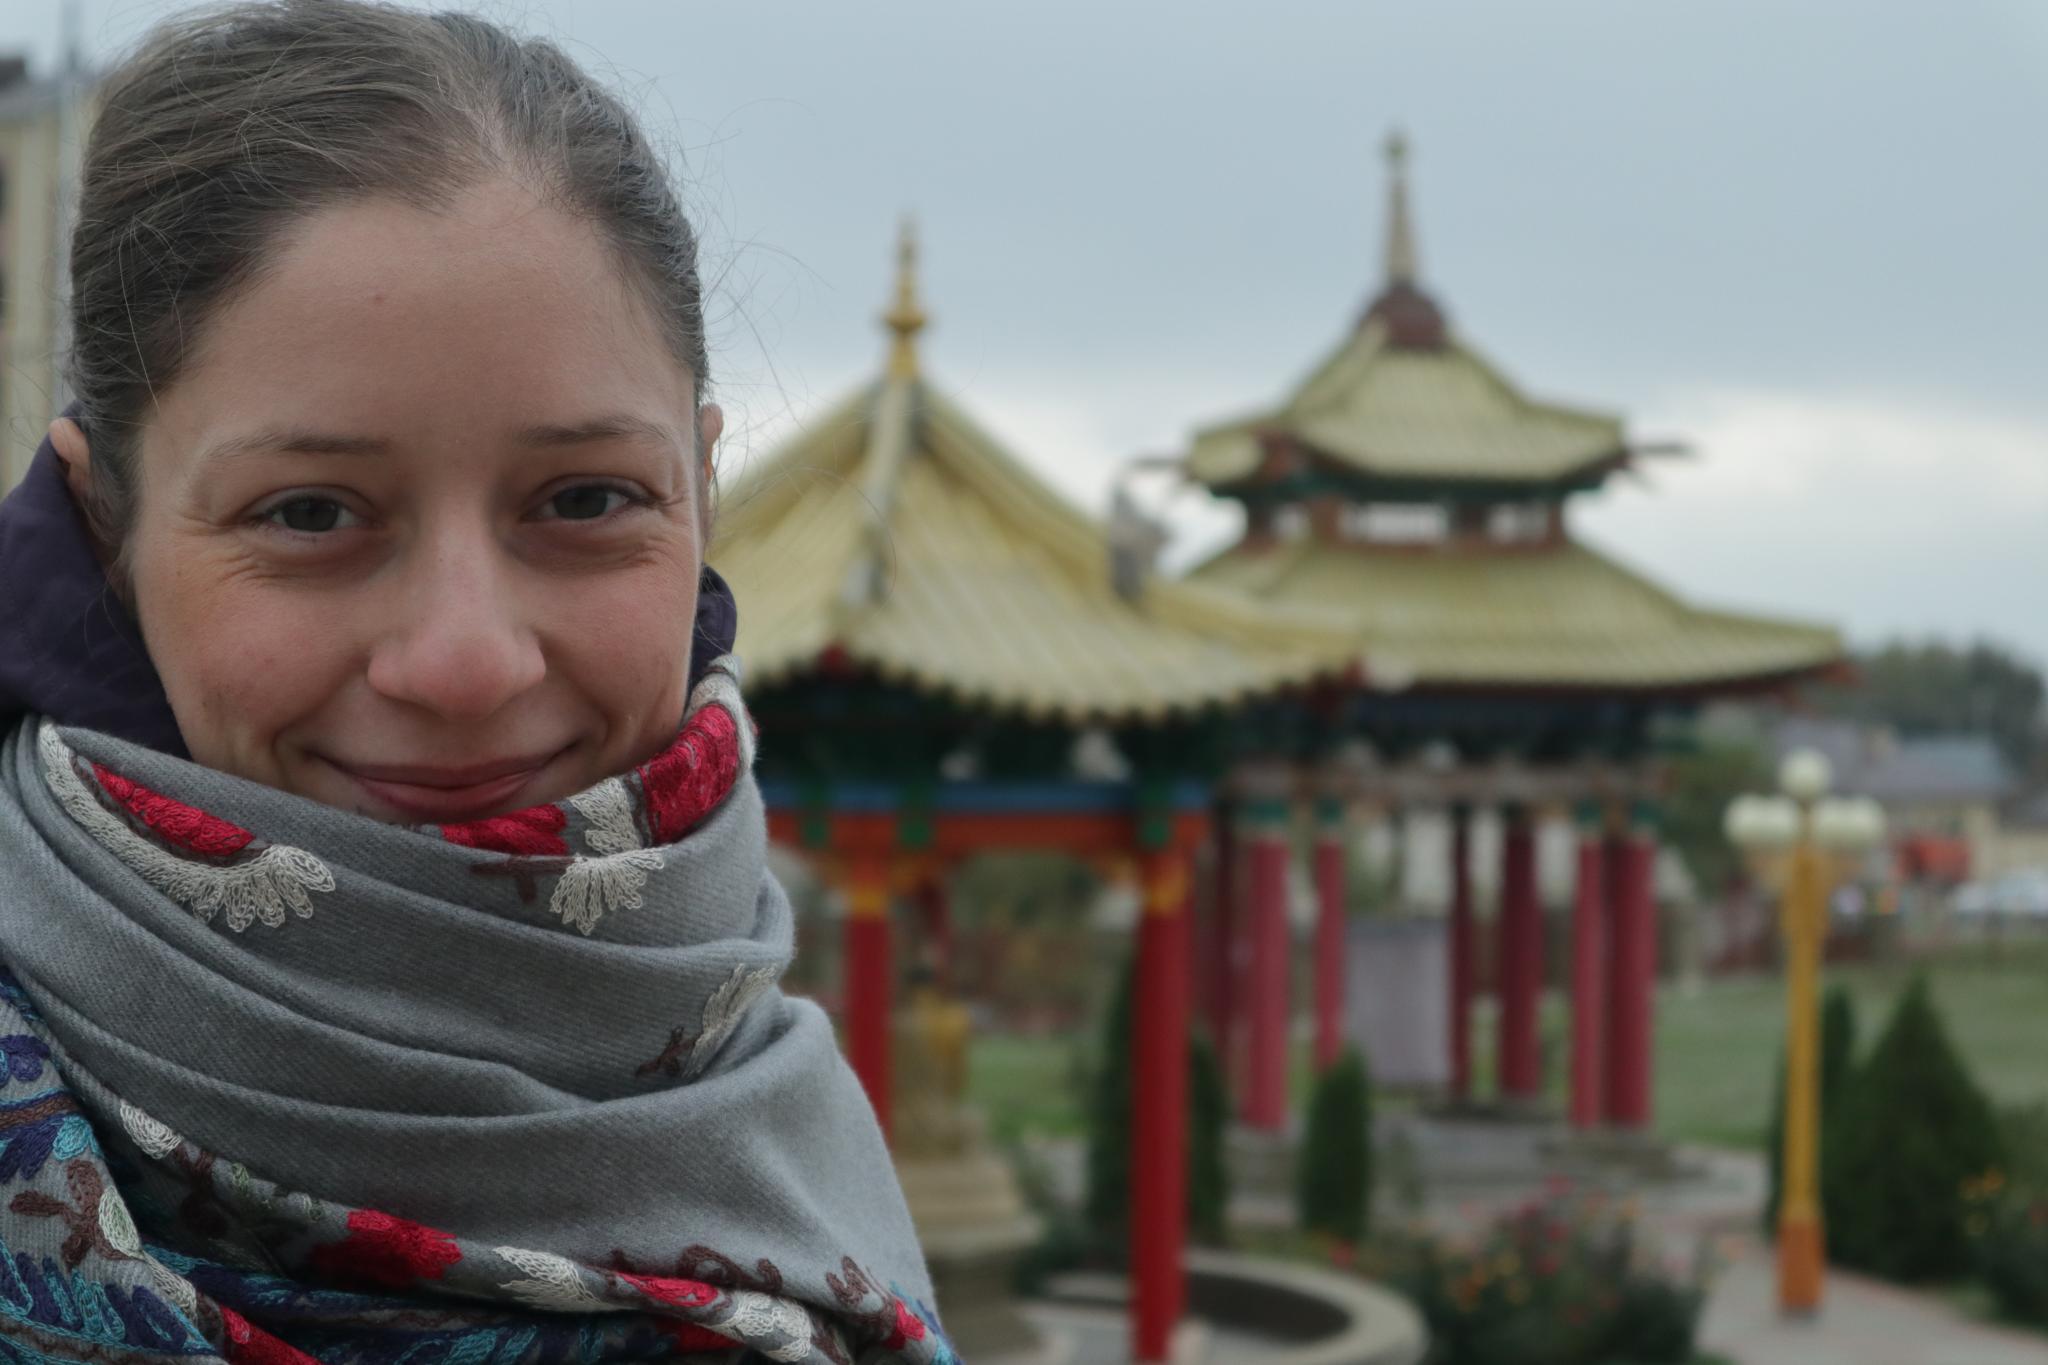 cestovateľka v mesta Elista, Rusko